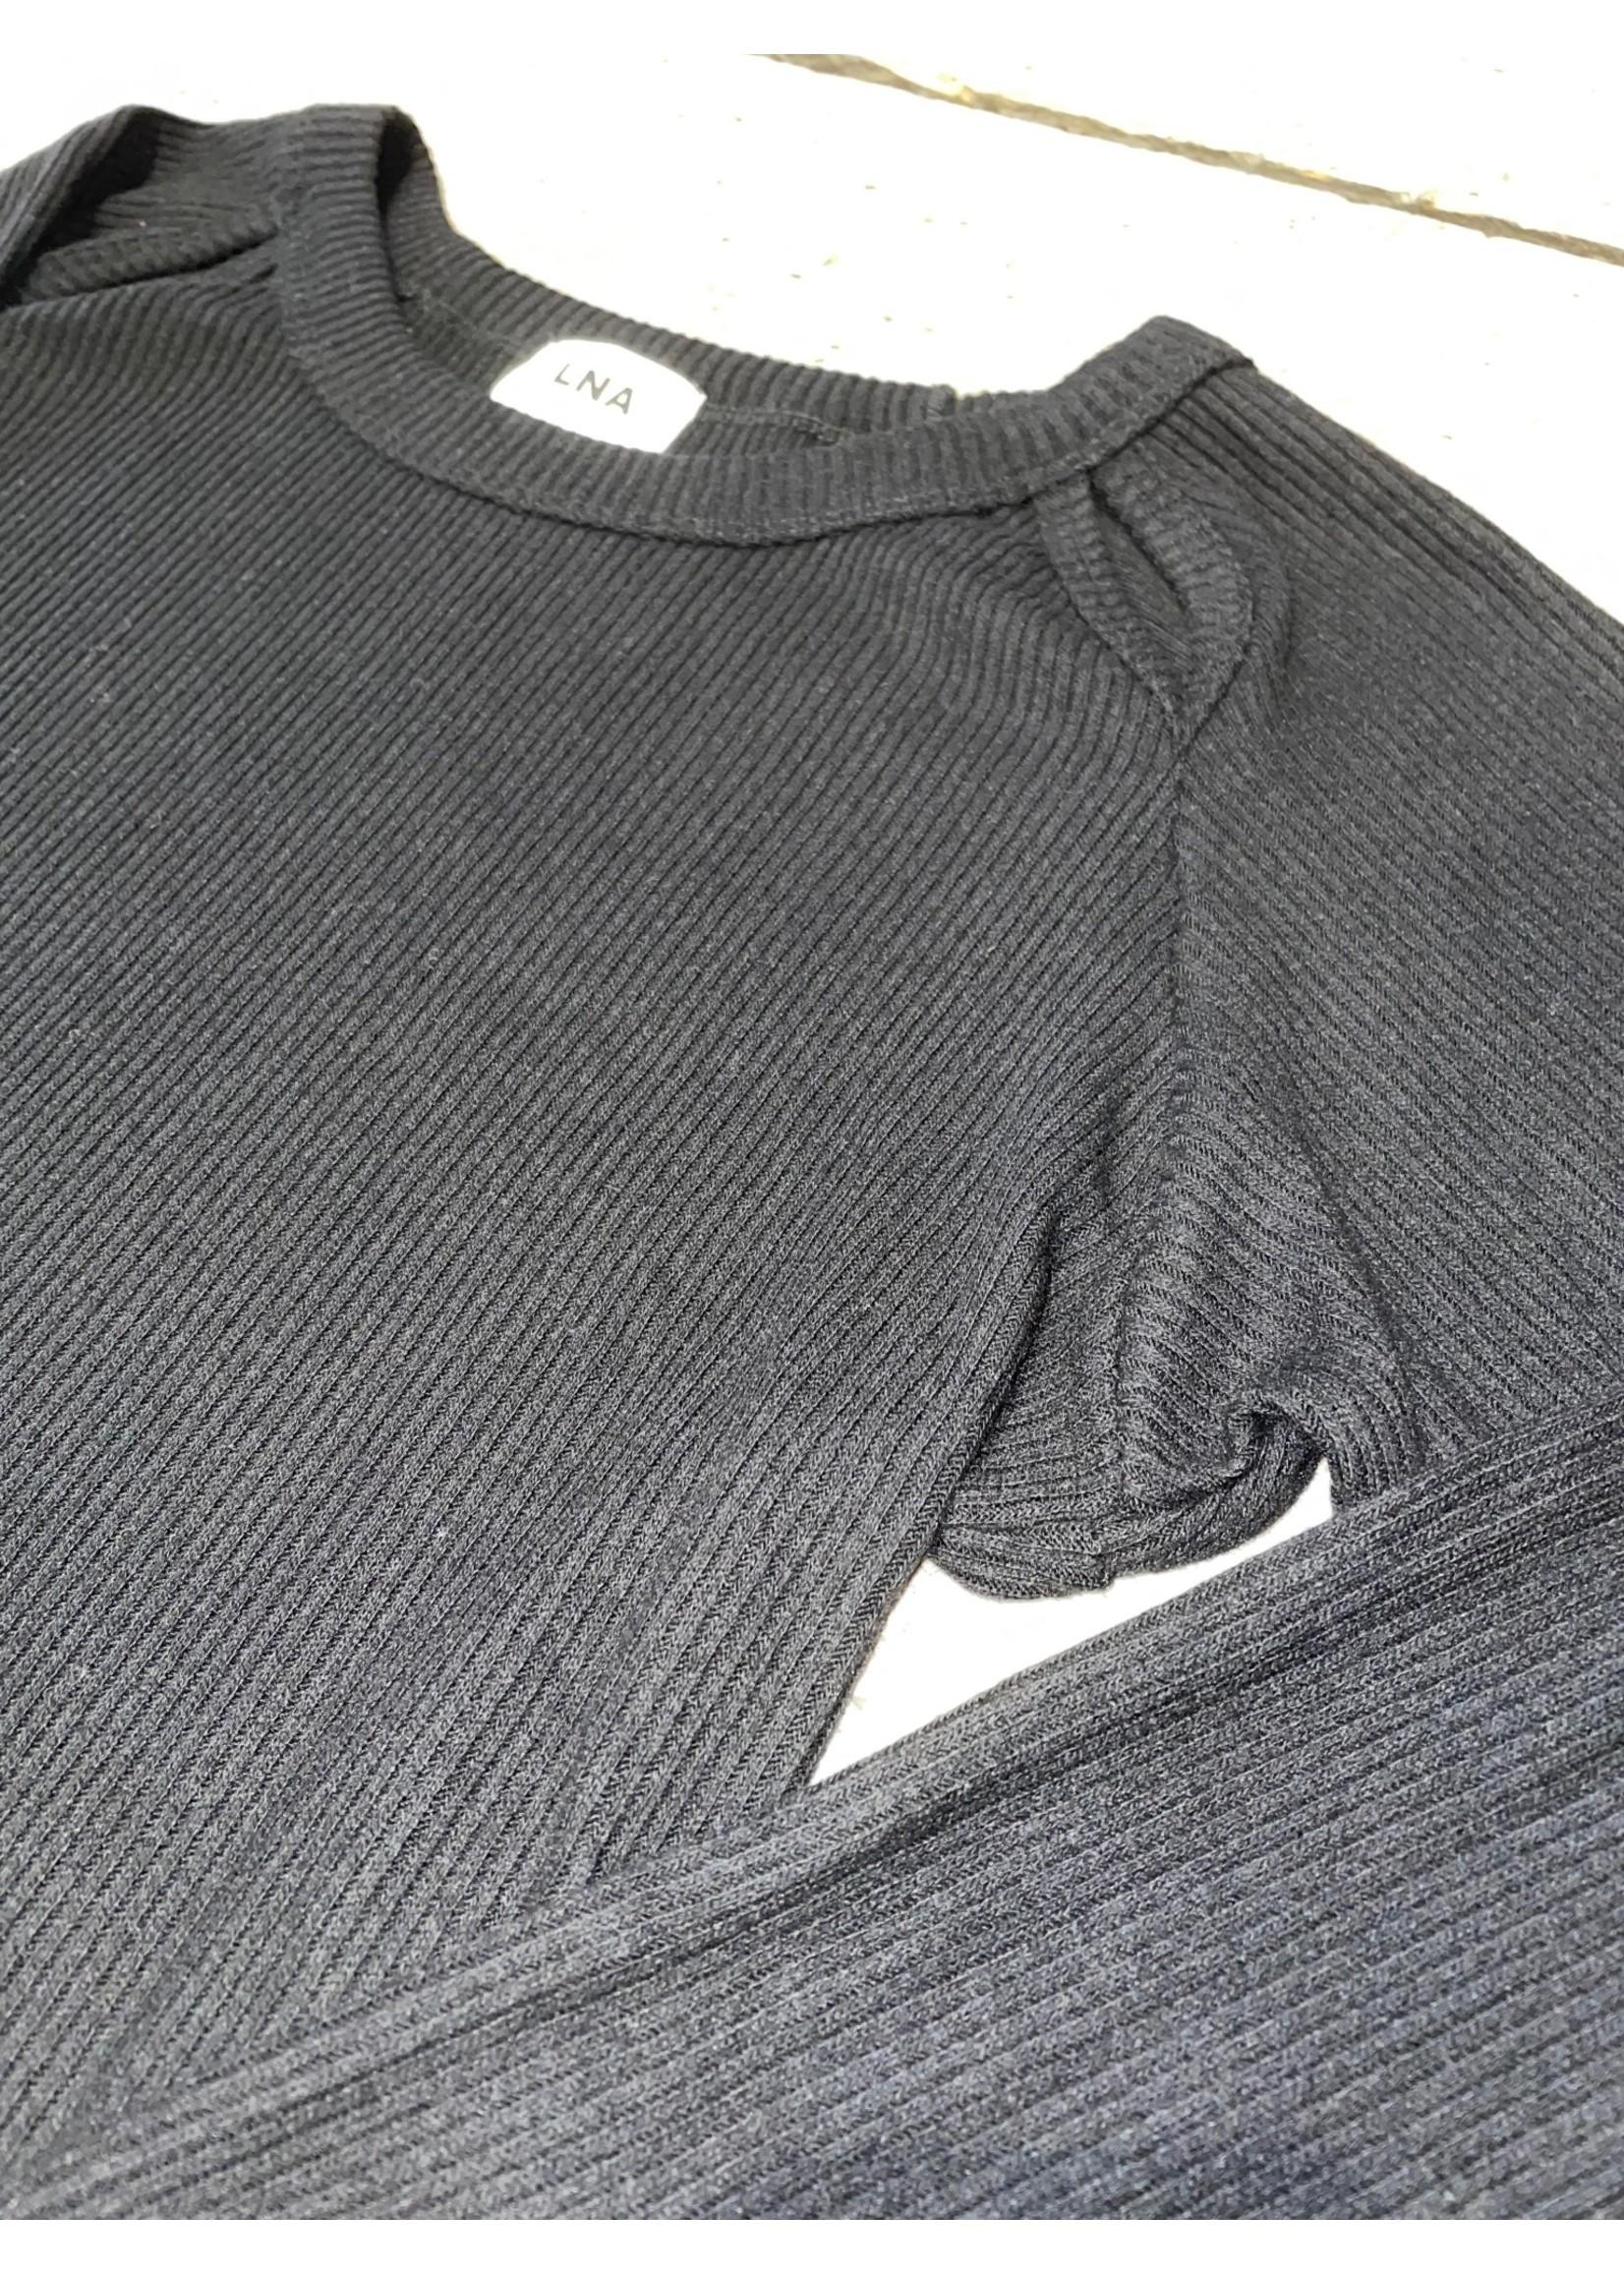 LNA LNA Brushed Rib Sweater